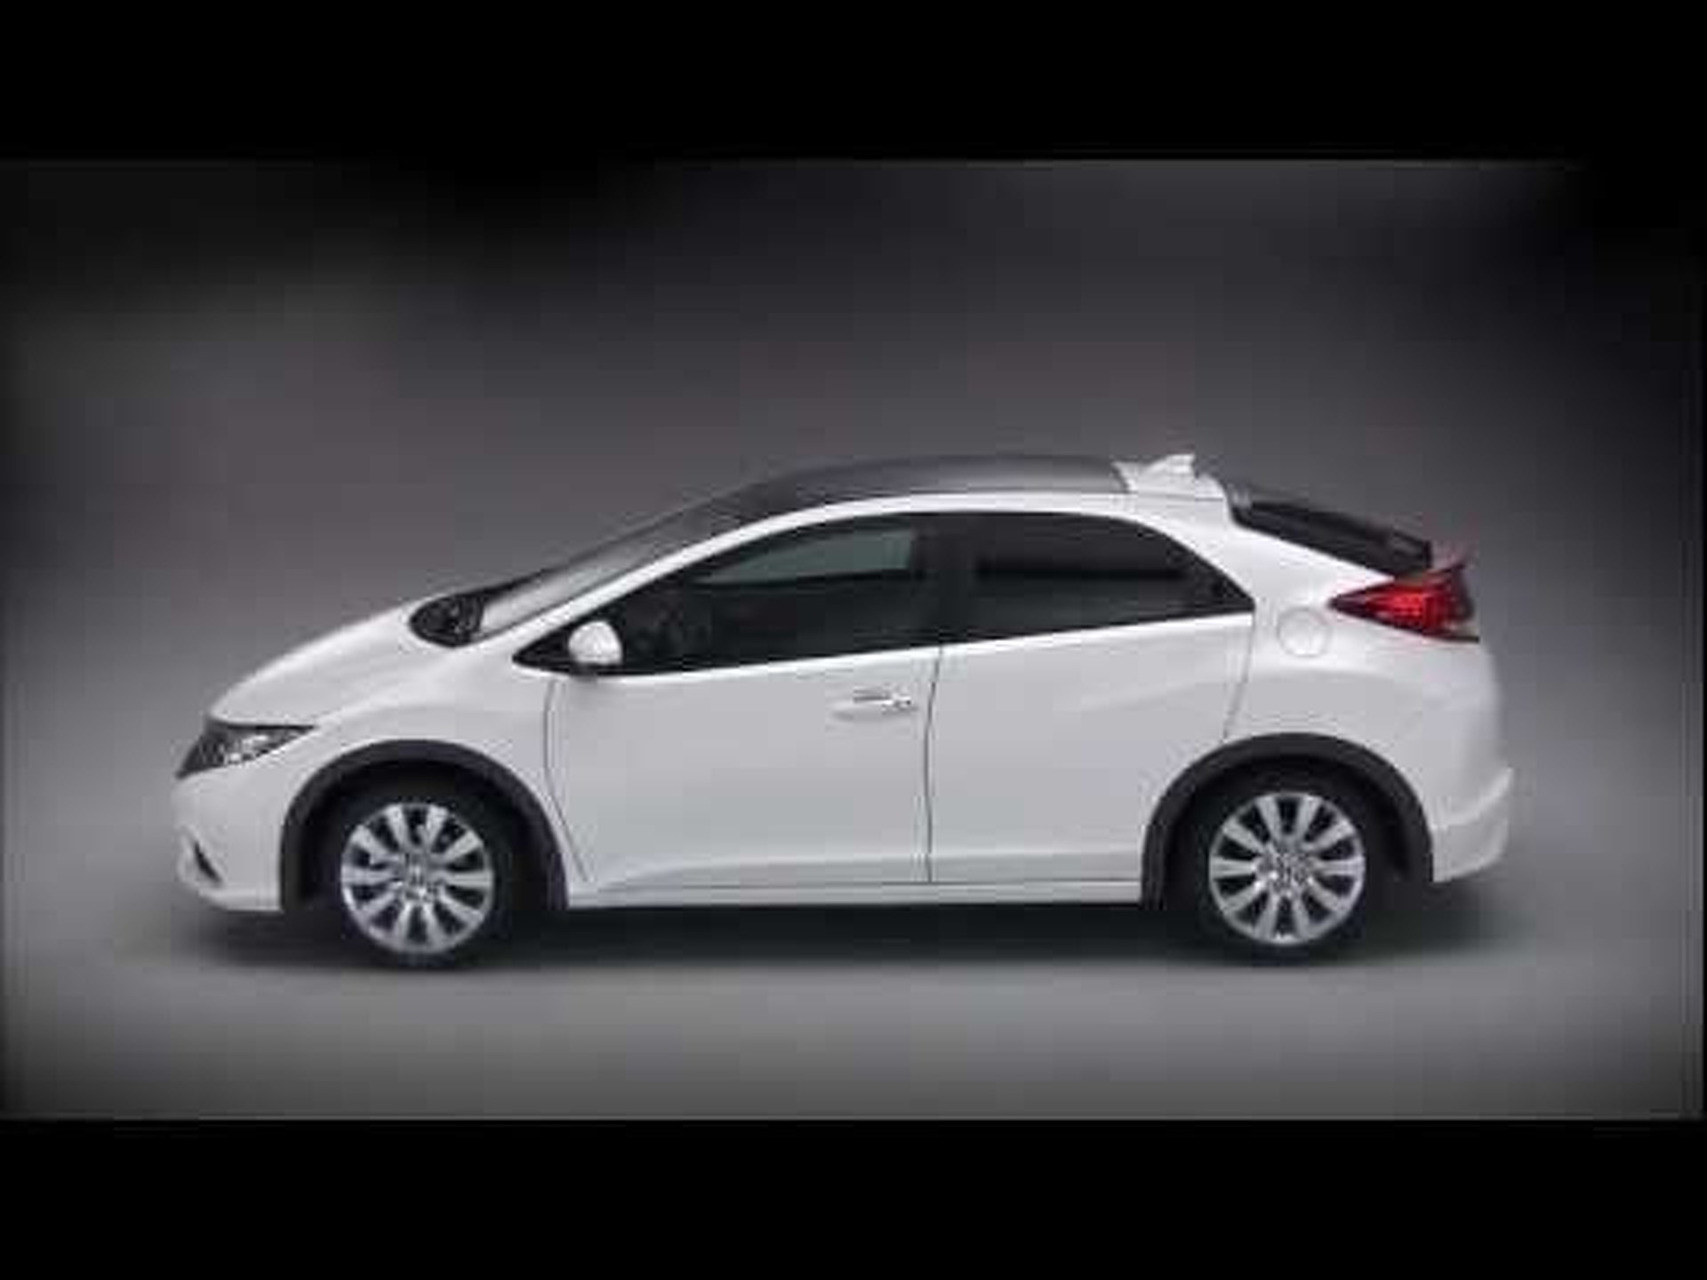 2012 Honda Civic EU Version